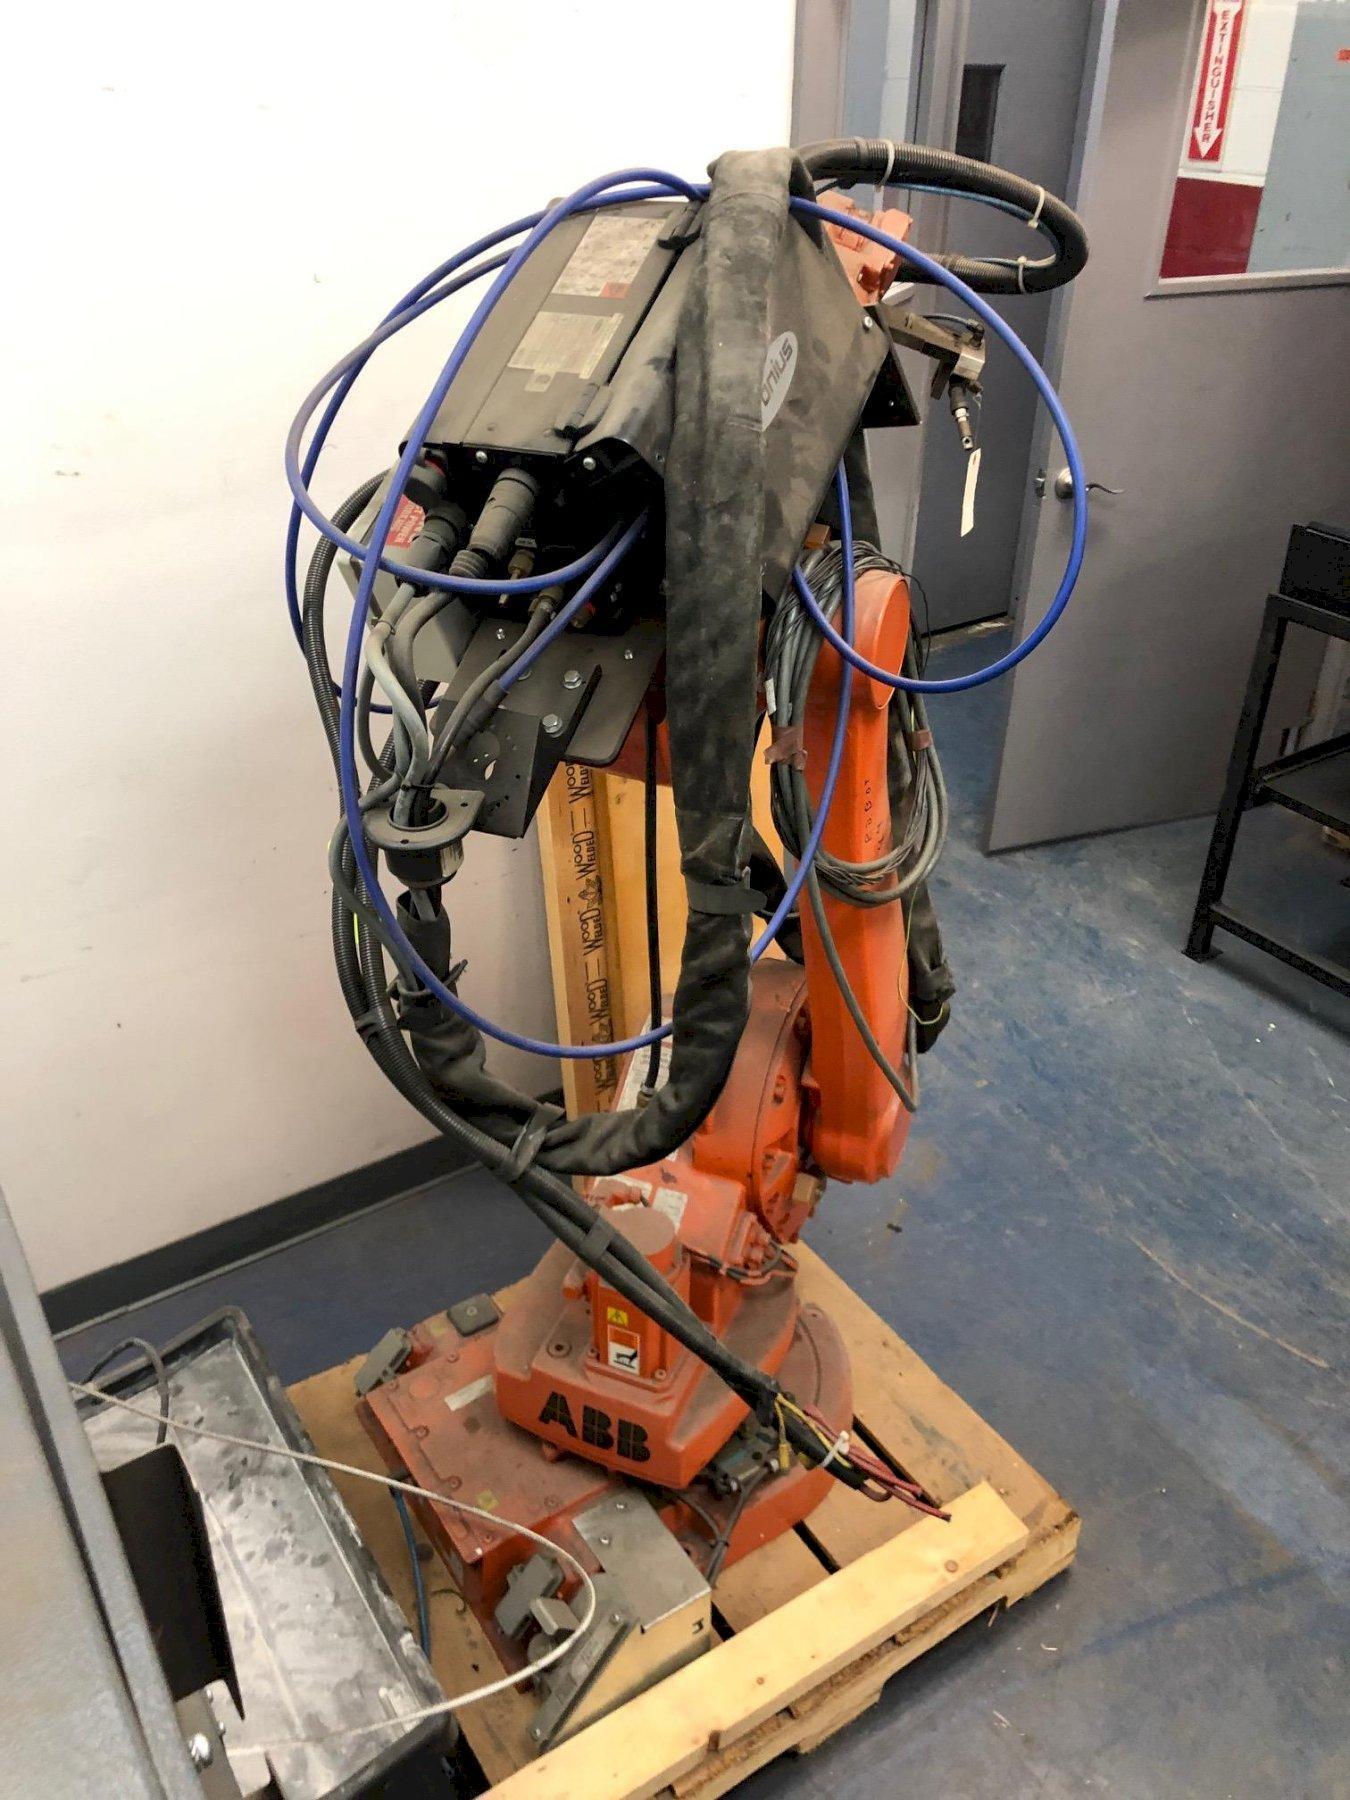 ABB Robot Model No.: IRB-1600-M2004